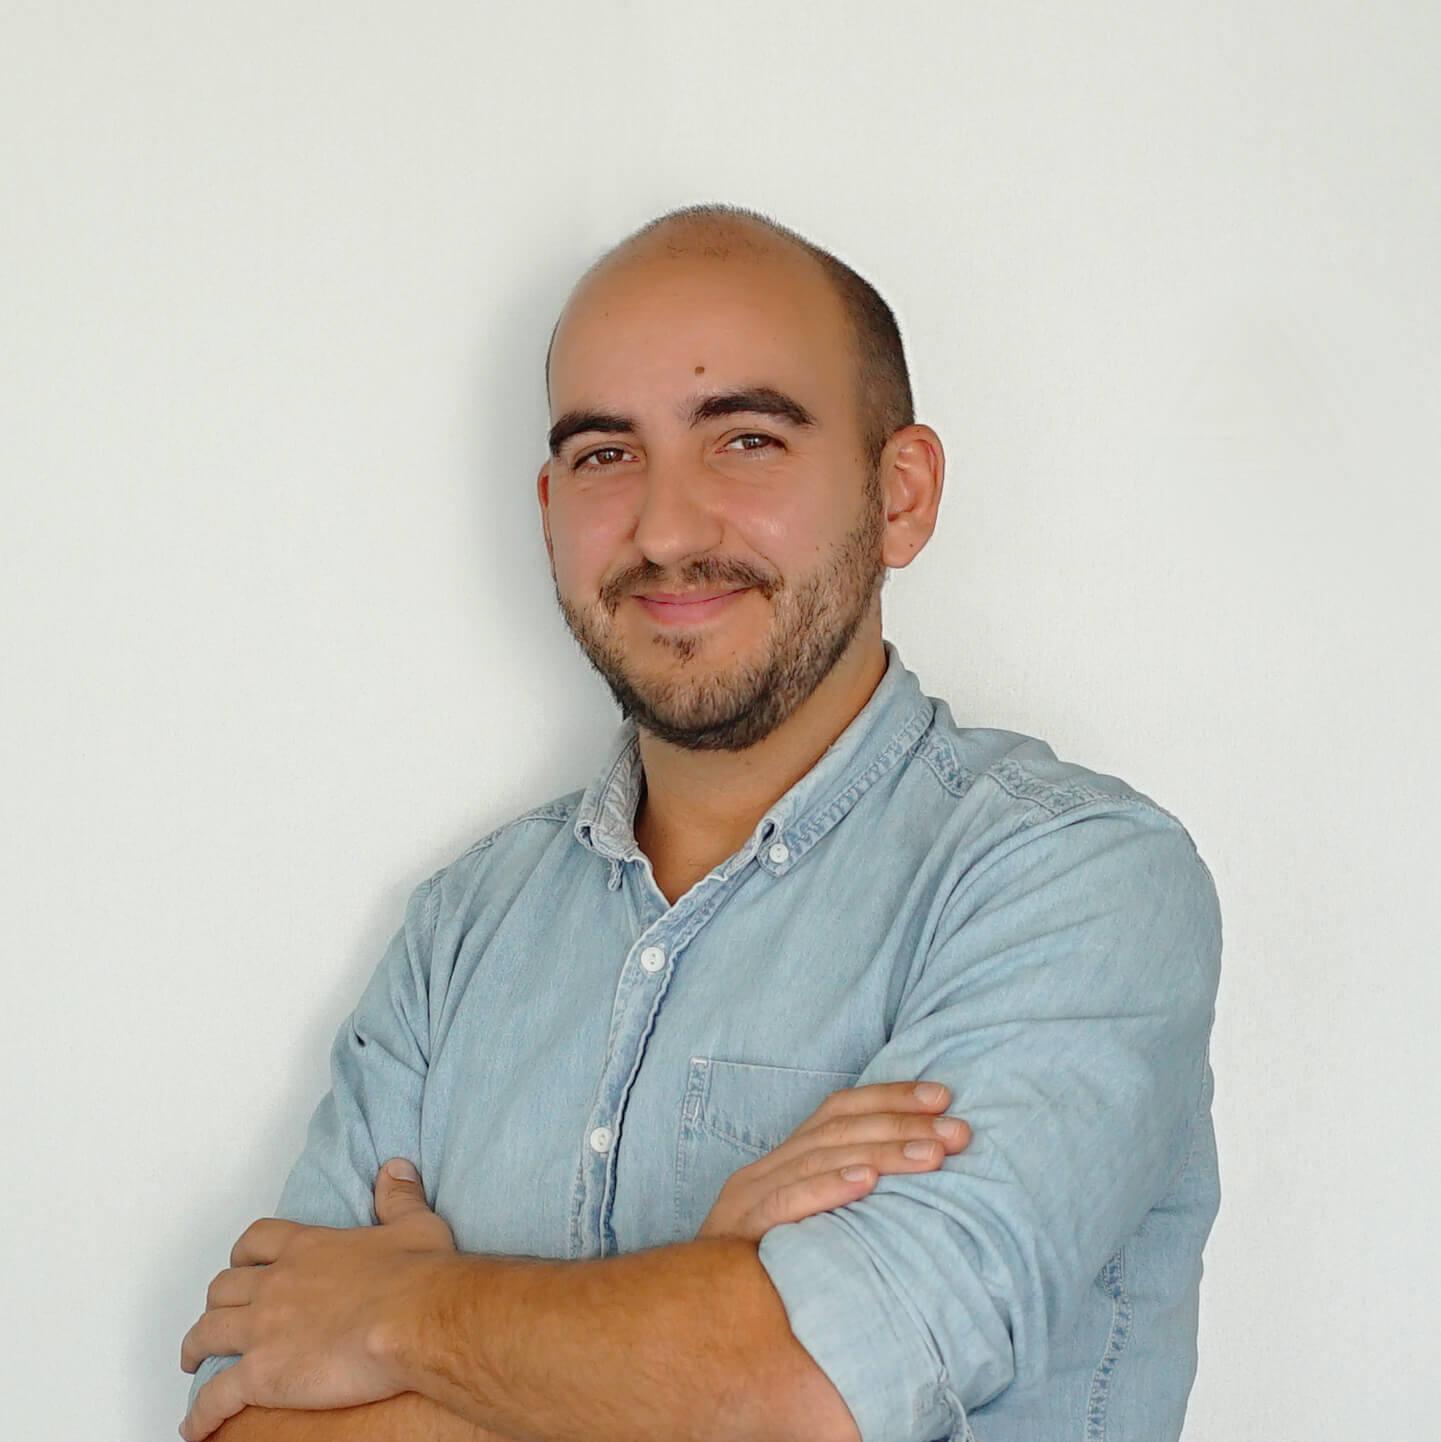 Ricardo Abreu - Talent Acquisition @ IT People Innovation